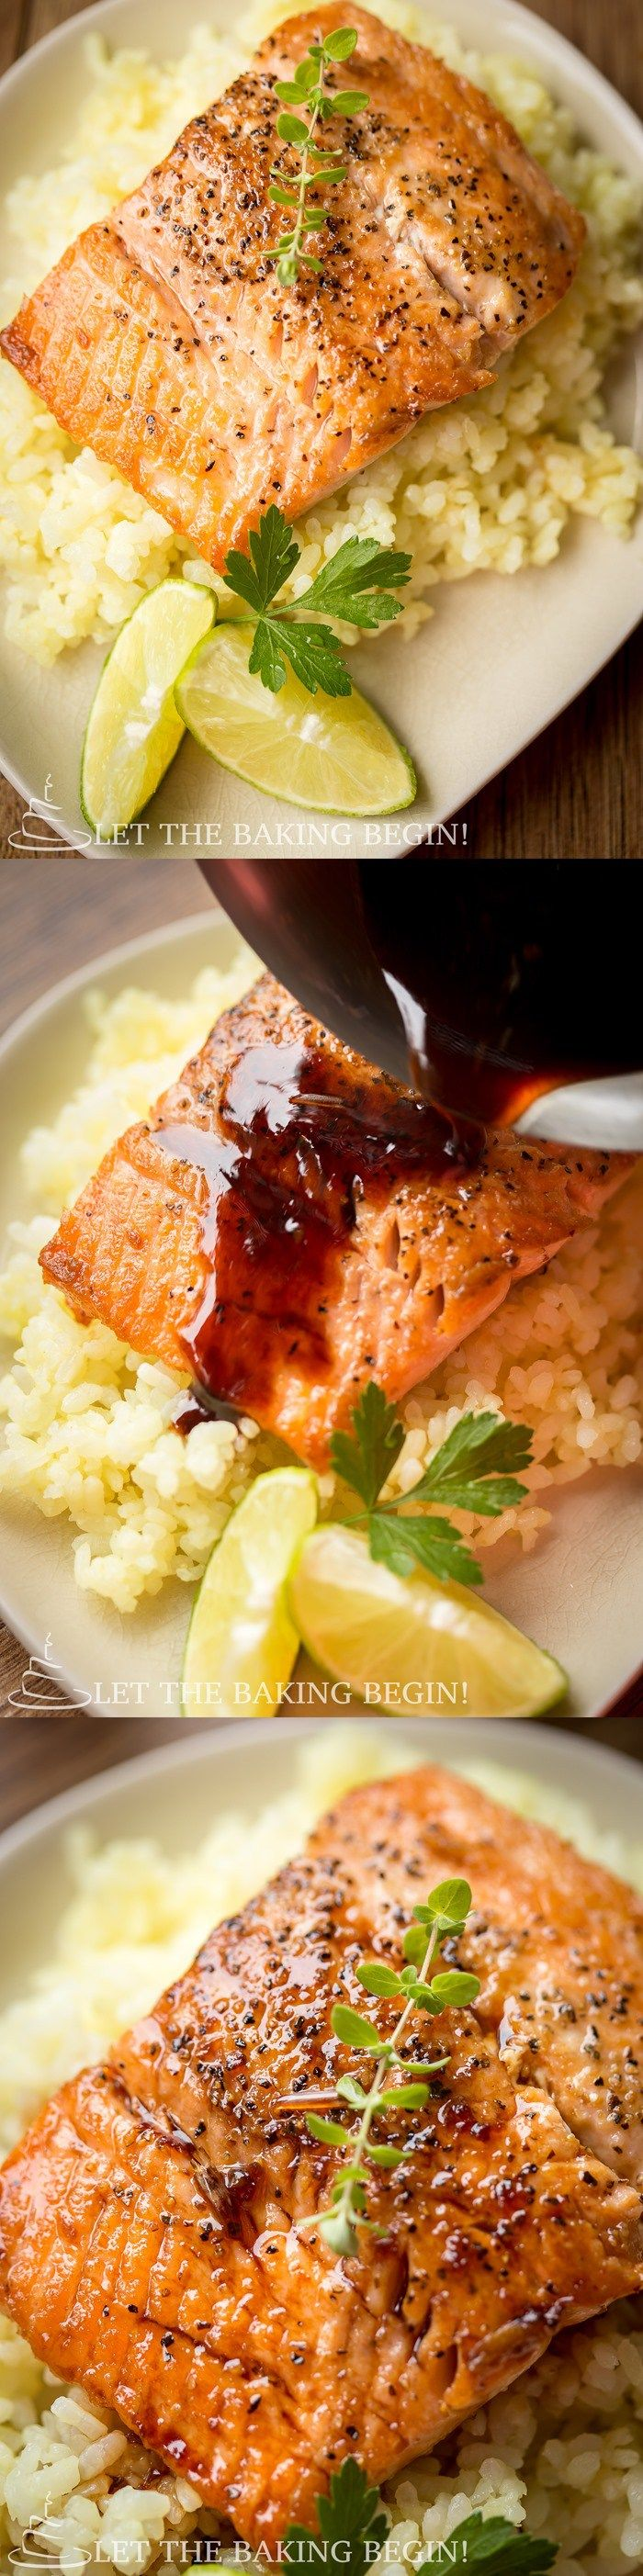 Ginger Garlic Glazed Salmon by letthebakingbegin #Salmon #Ginger #Healthy